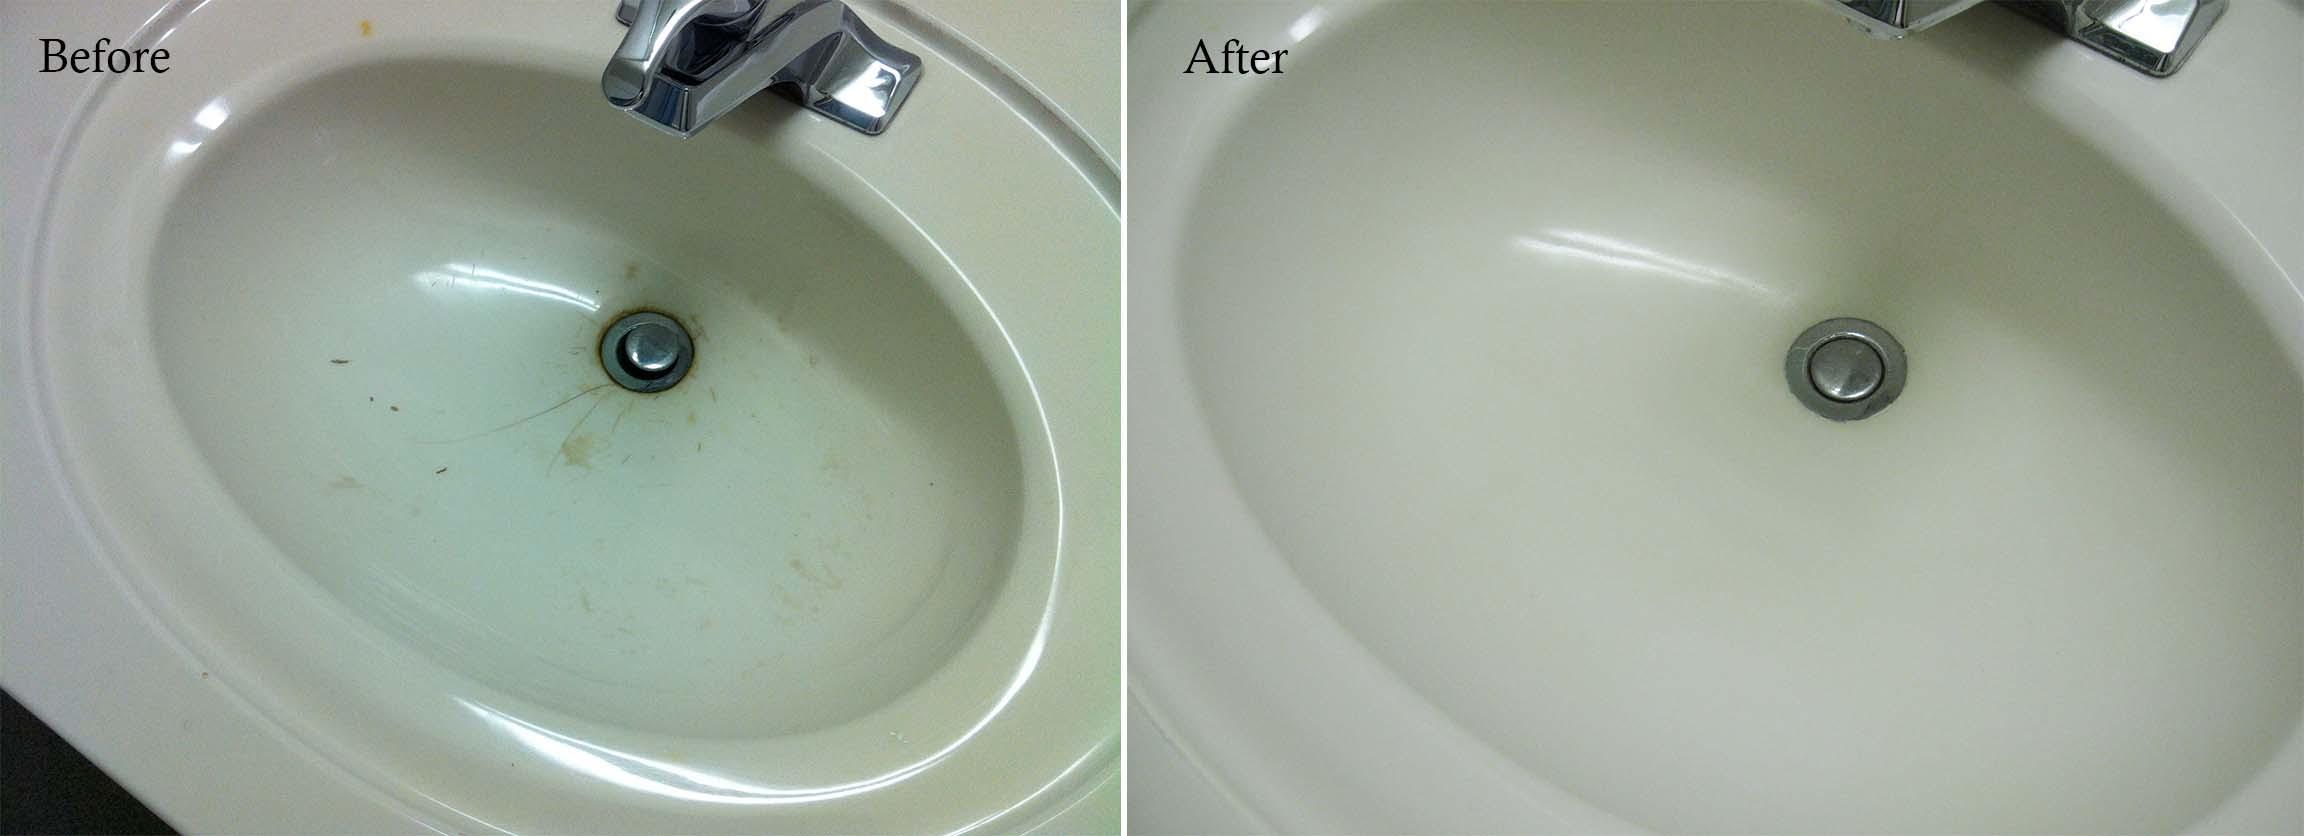 enamel repair kit bath sink shower tray